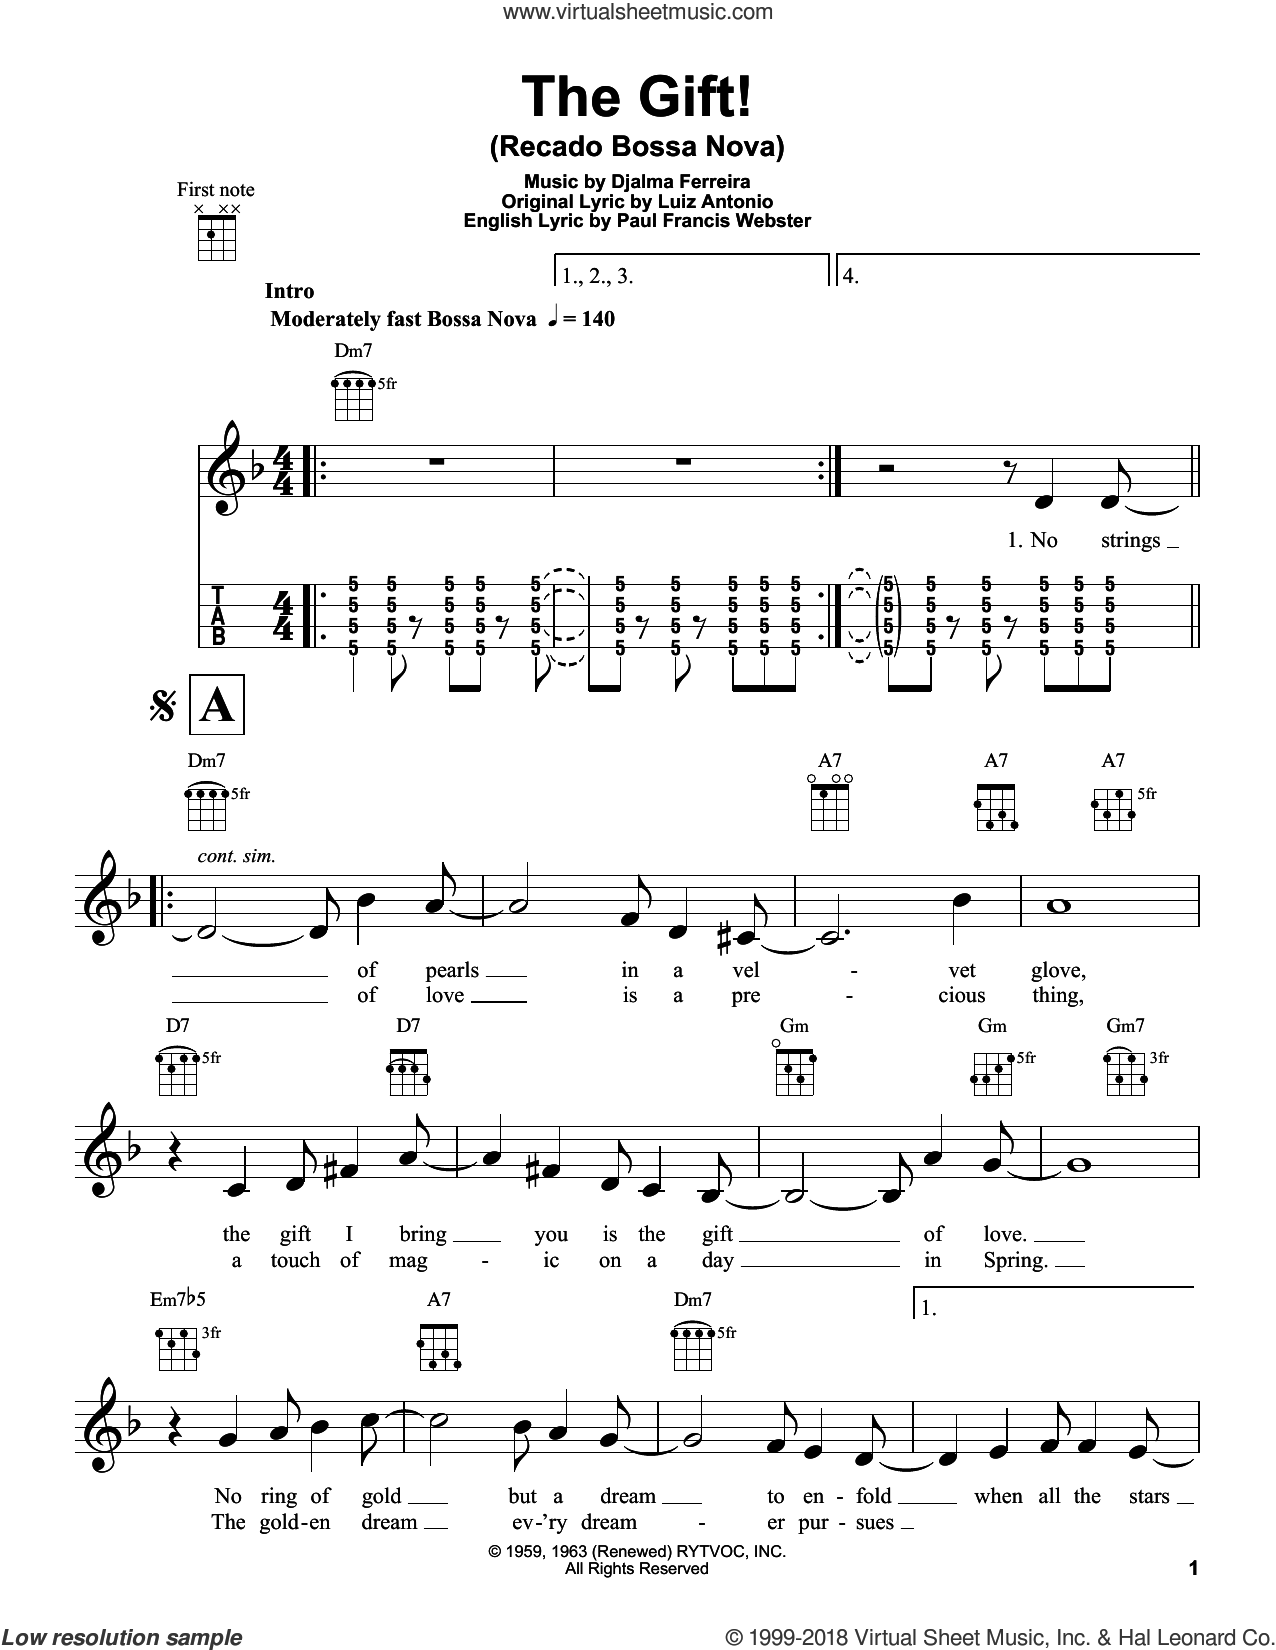 The Gift! (Recado Bossa Nova) sheet music for ukulele by Paul Francis Webster, Djalma Ferreira and Luiz Antonio, intermediate skill level